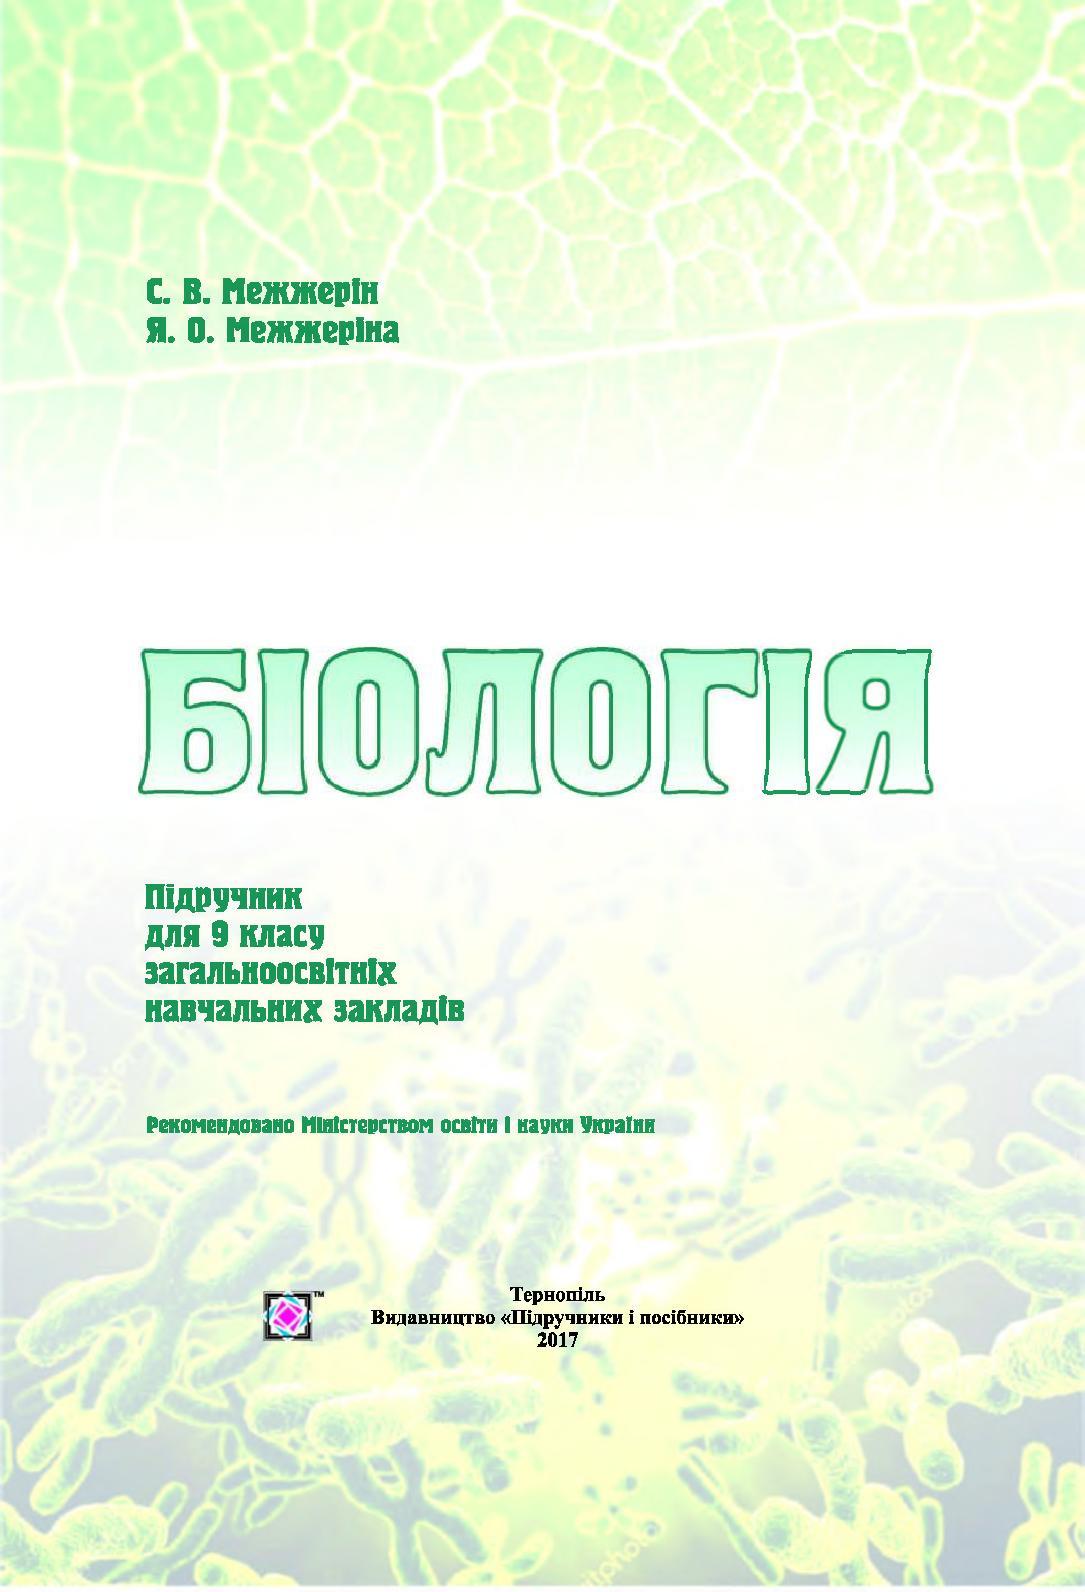 Calaméo - 9 Klas Biologija Mezhzherin 2017 b394d2e8edae0